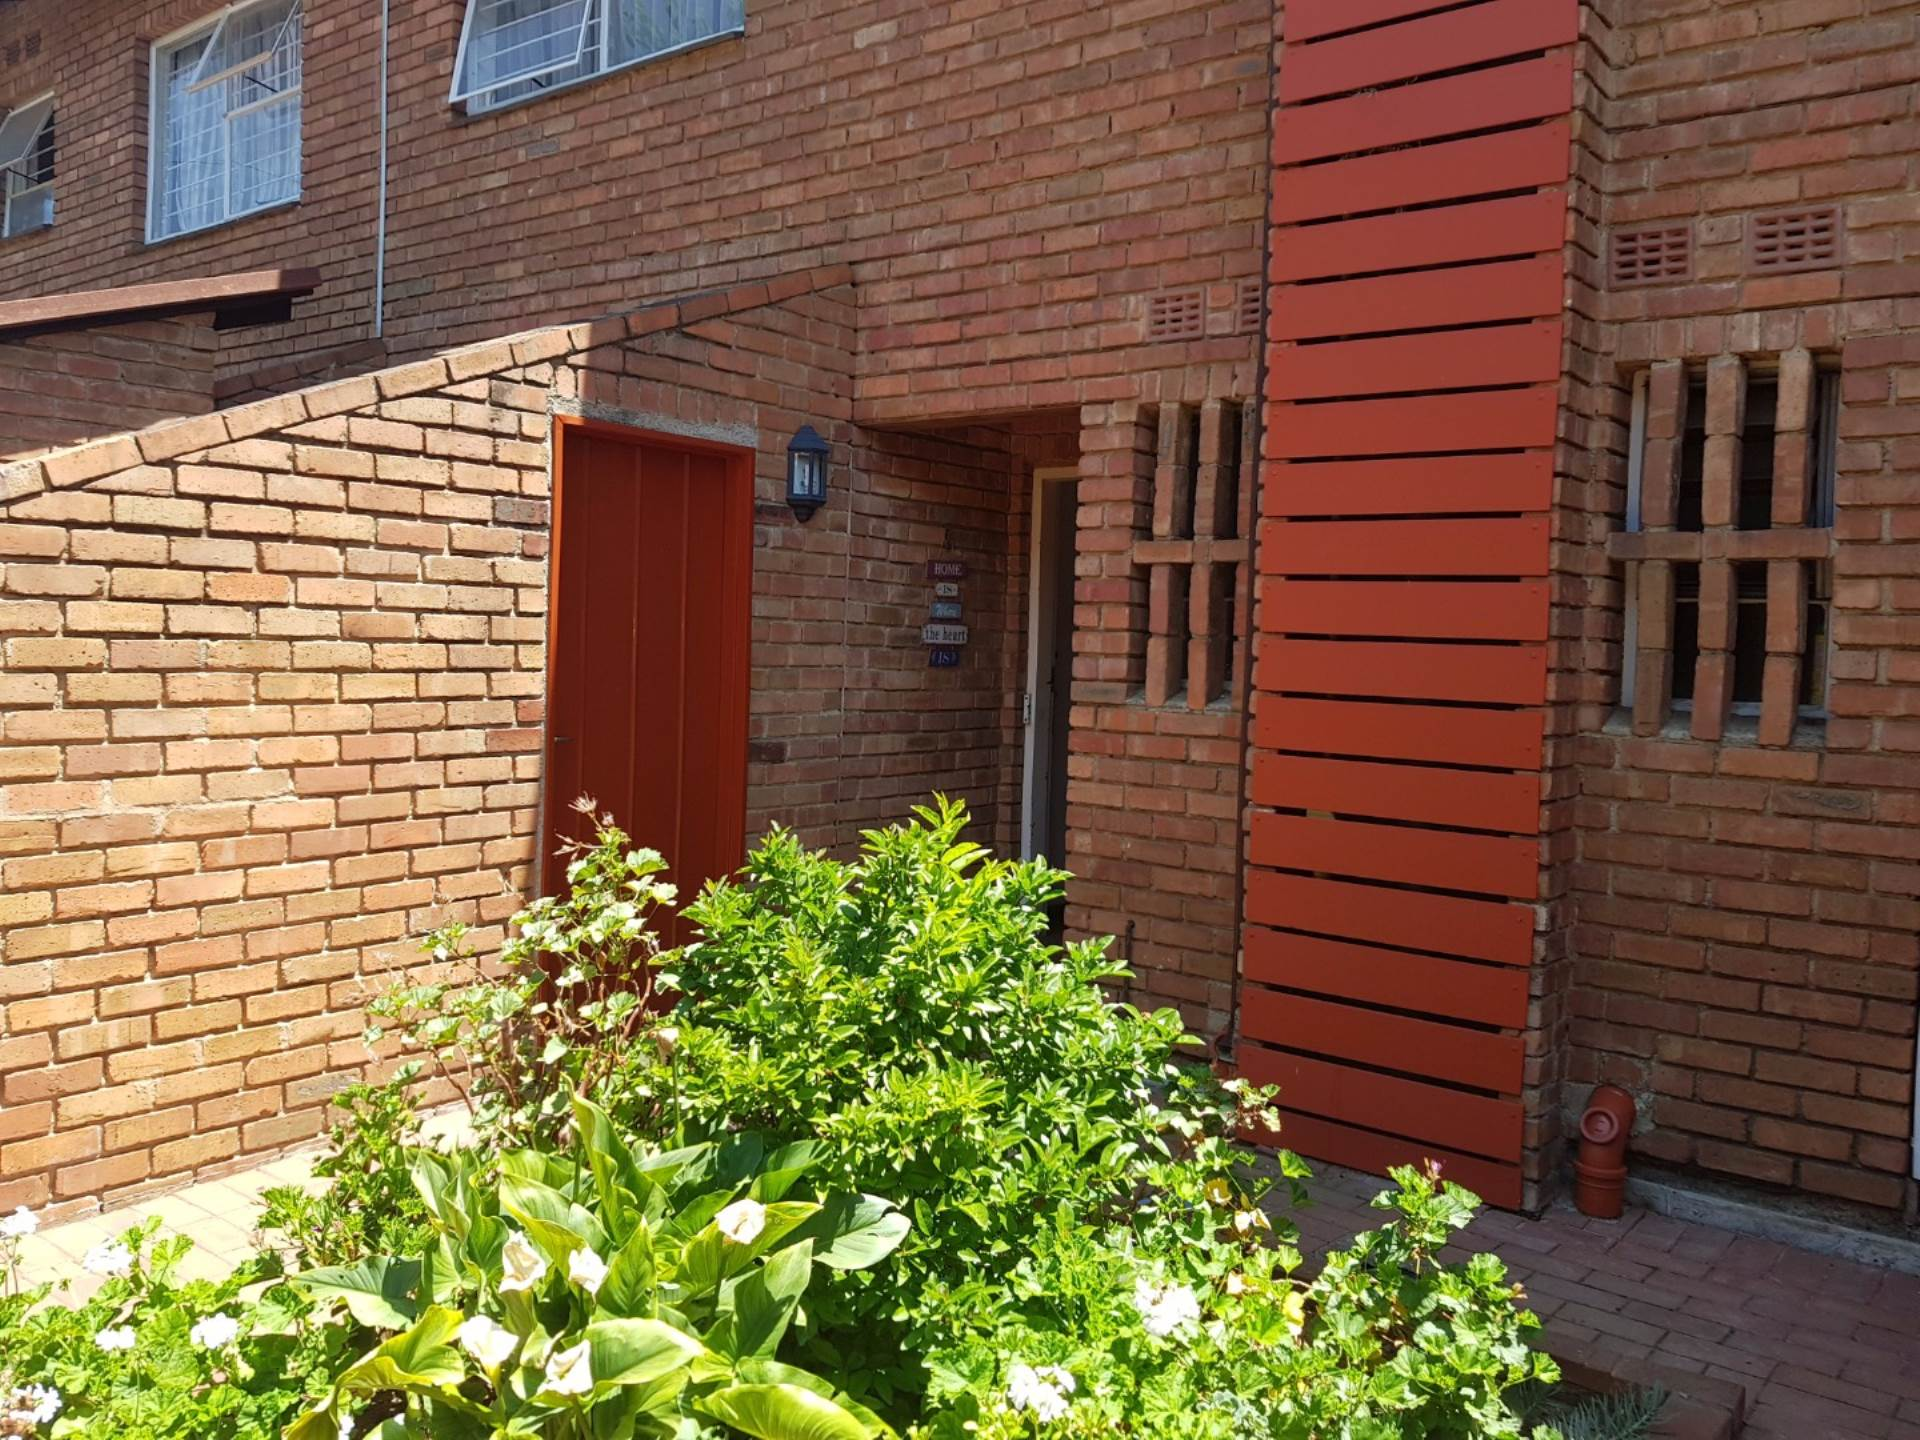 3 BedroomTownhouse To Rent In Bedford Gardens